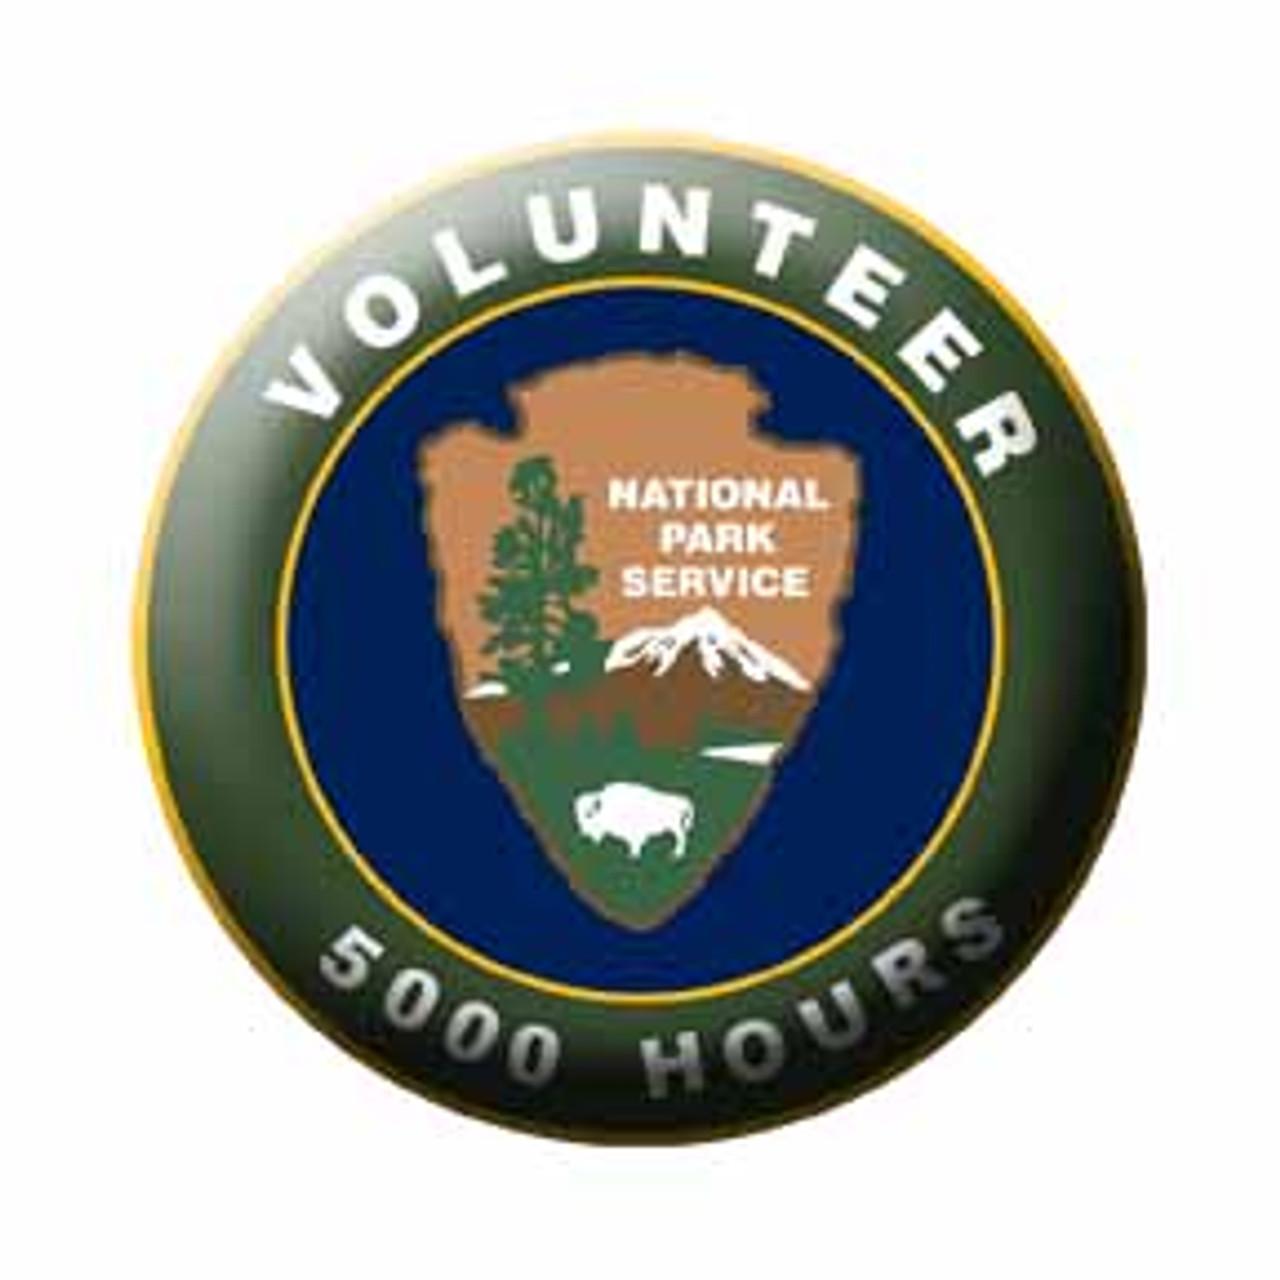 National Park Service Volunteer Hour Pins (2500 hours)